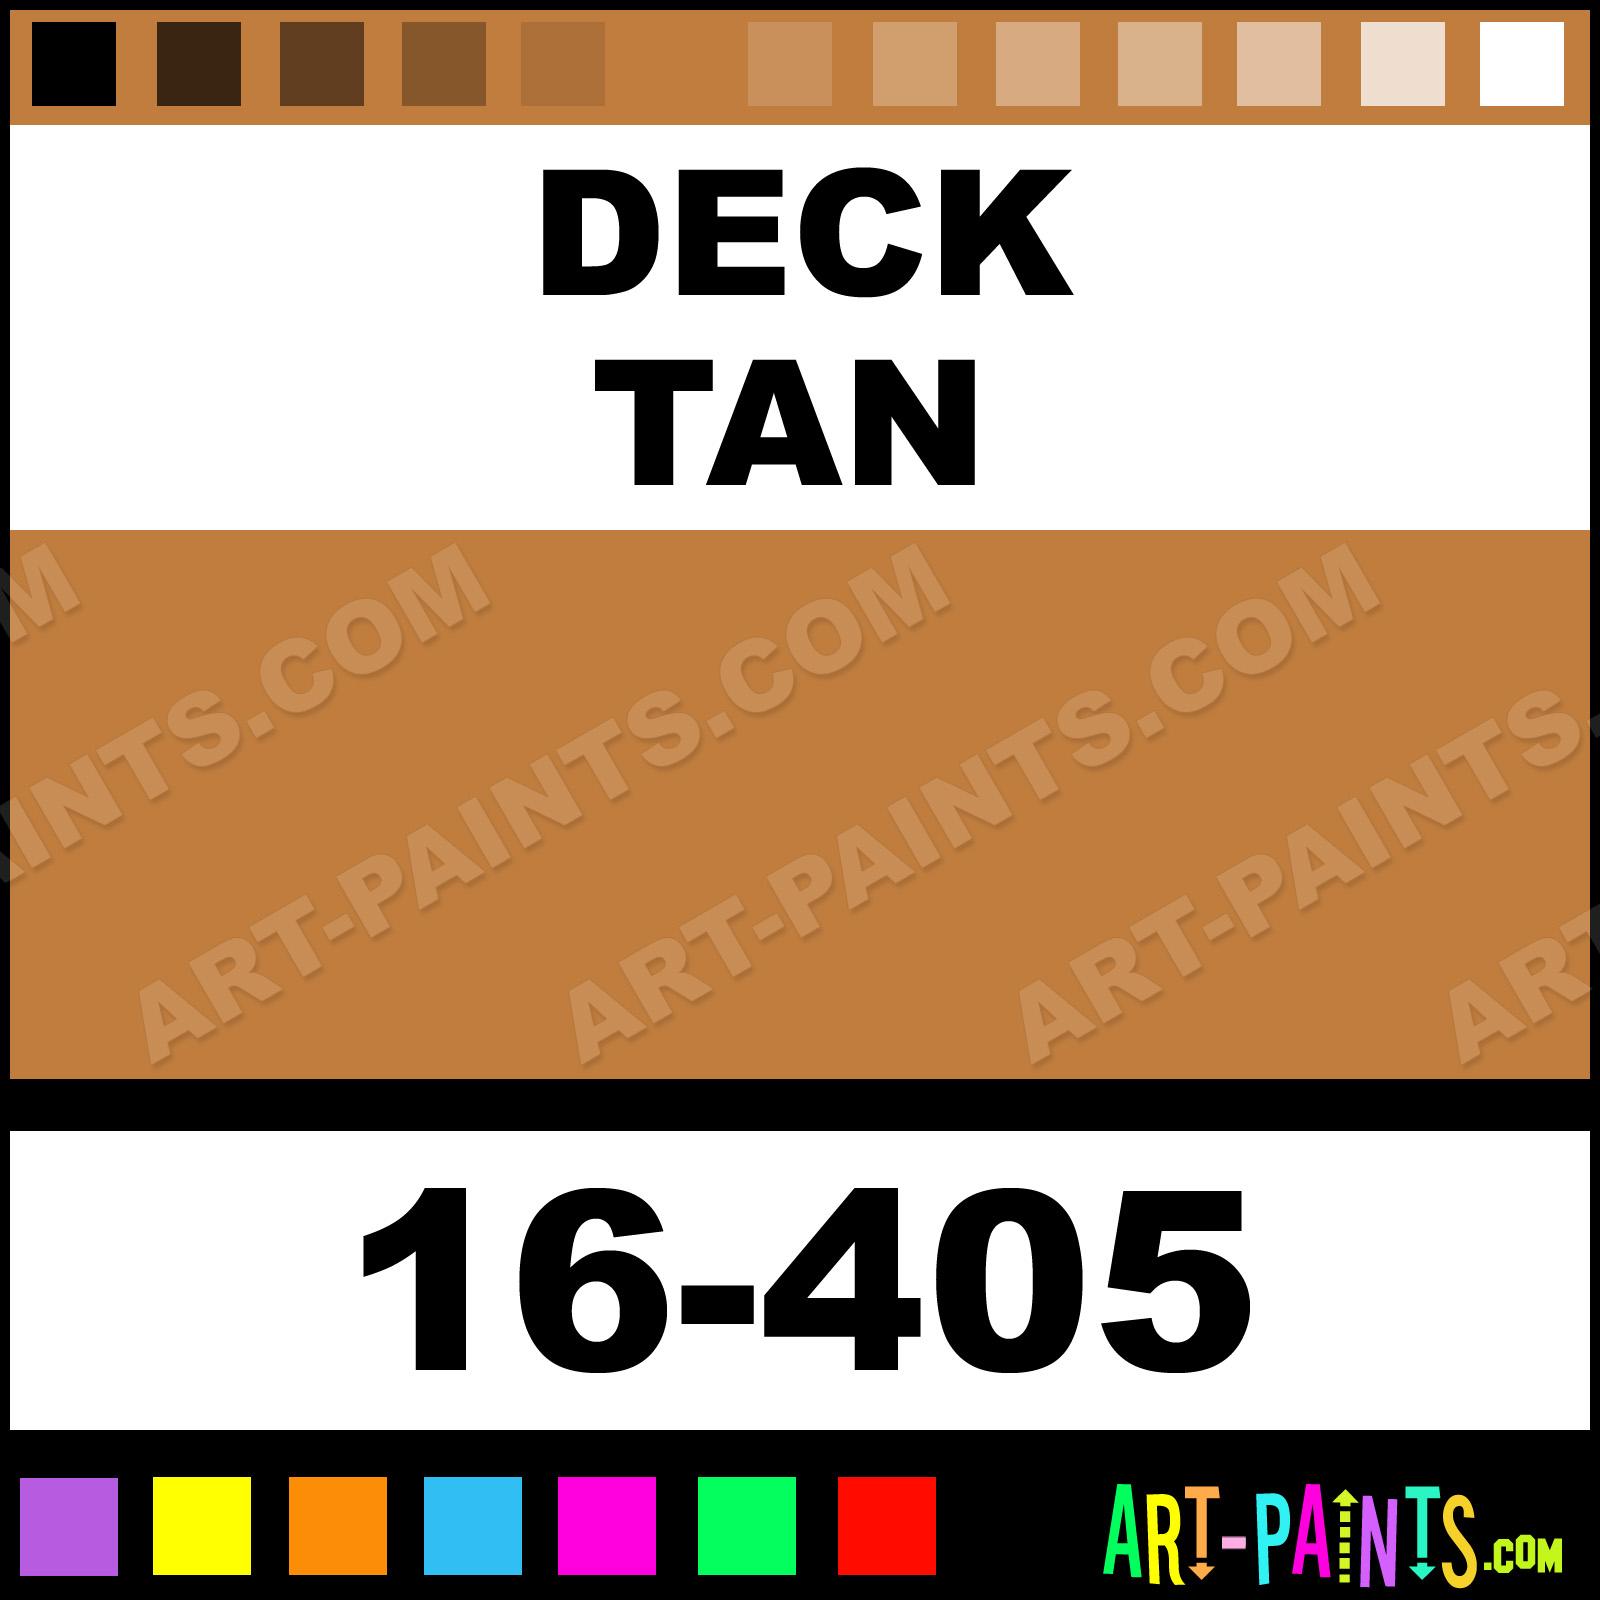 Deck Tan ModelFlex Marine Airbrush Spray Paints - 16-405